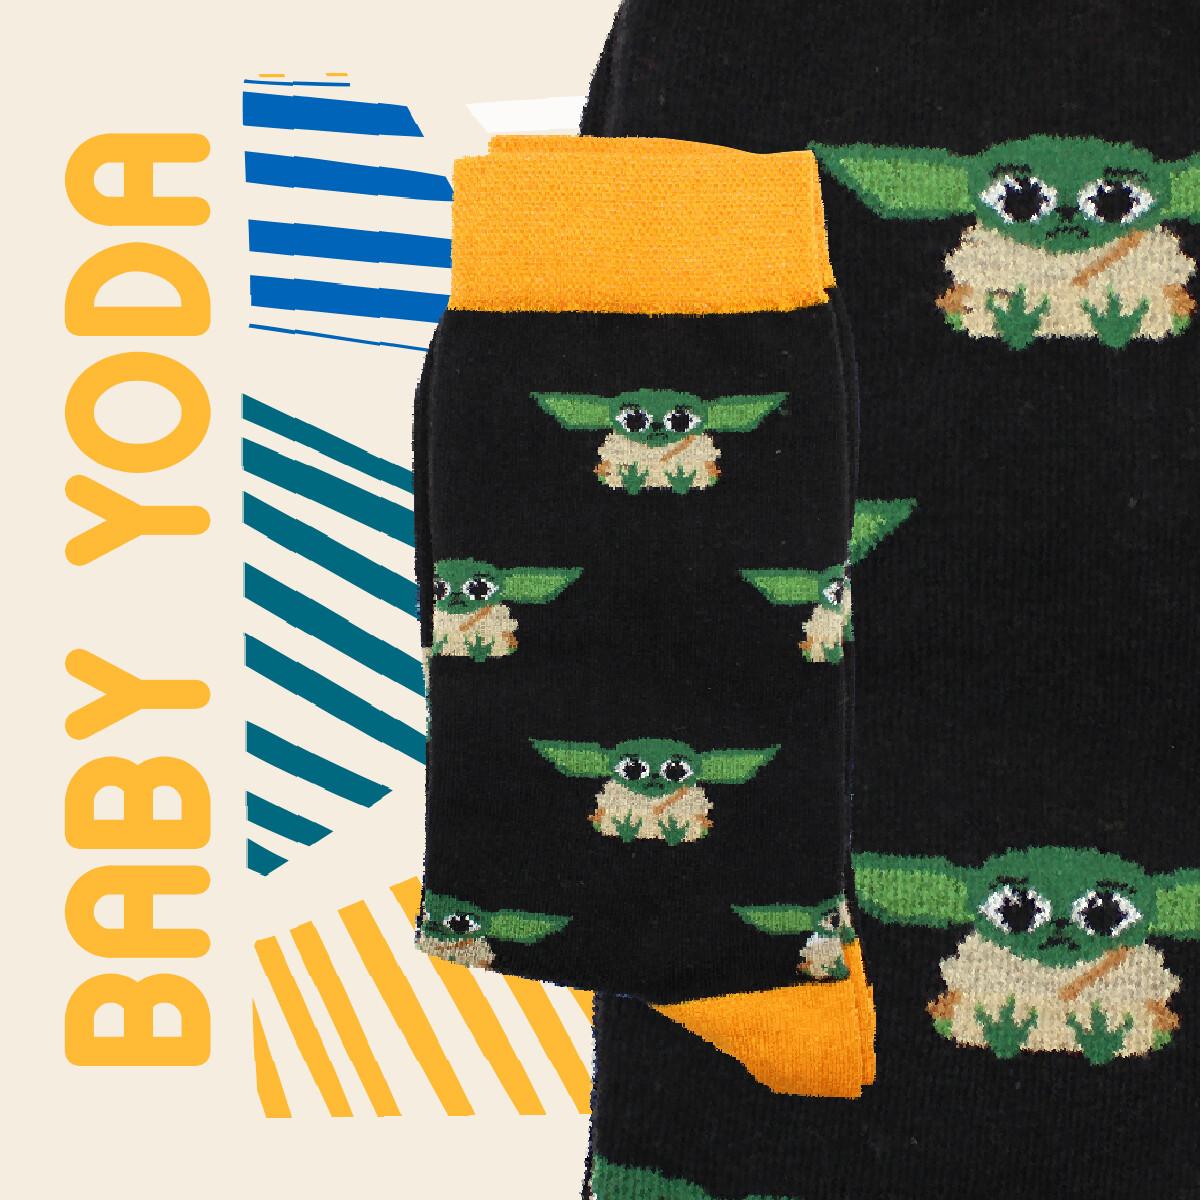 Baby Yoda-ს წინდები